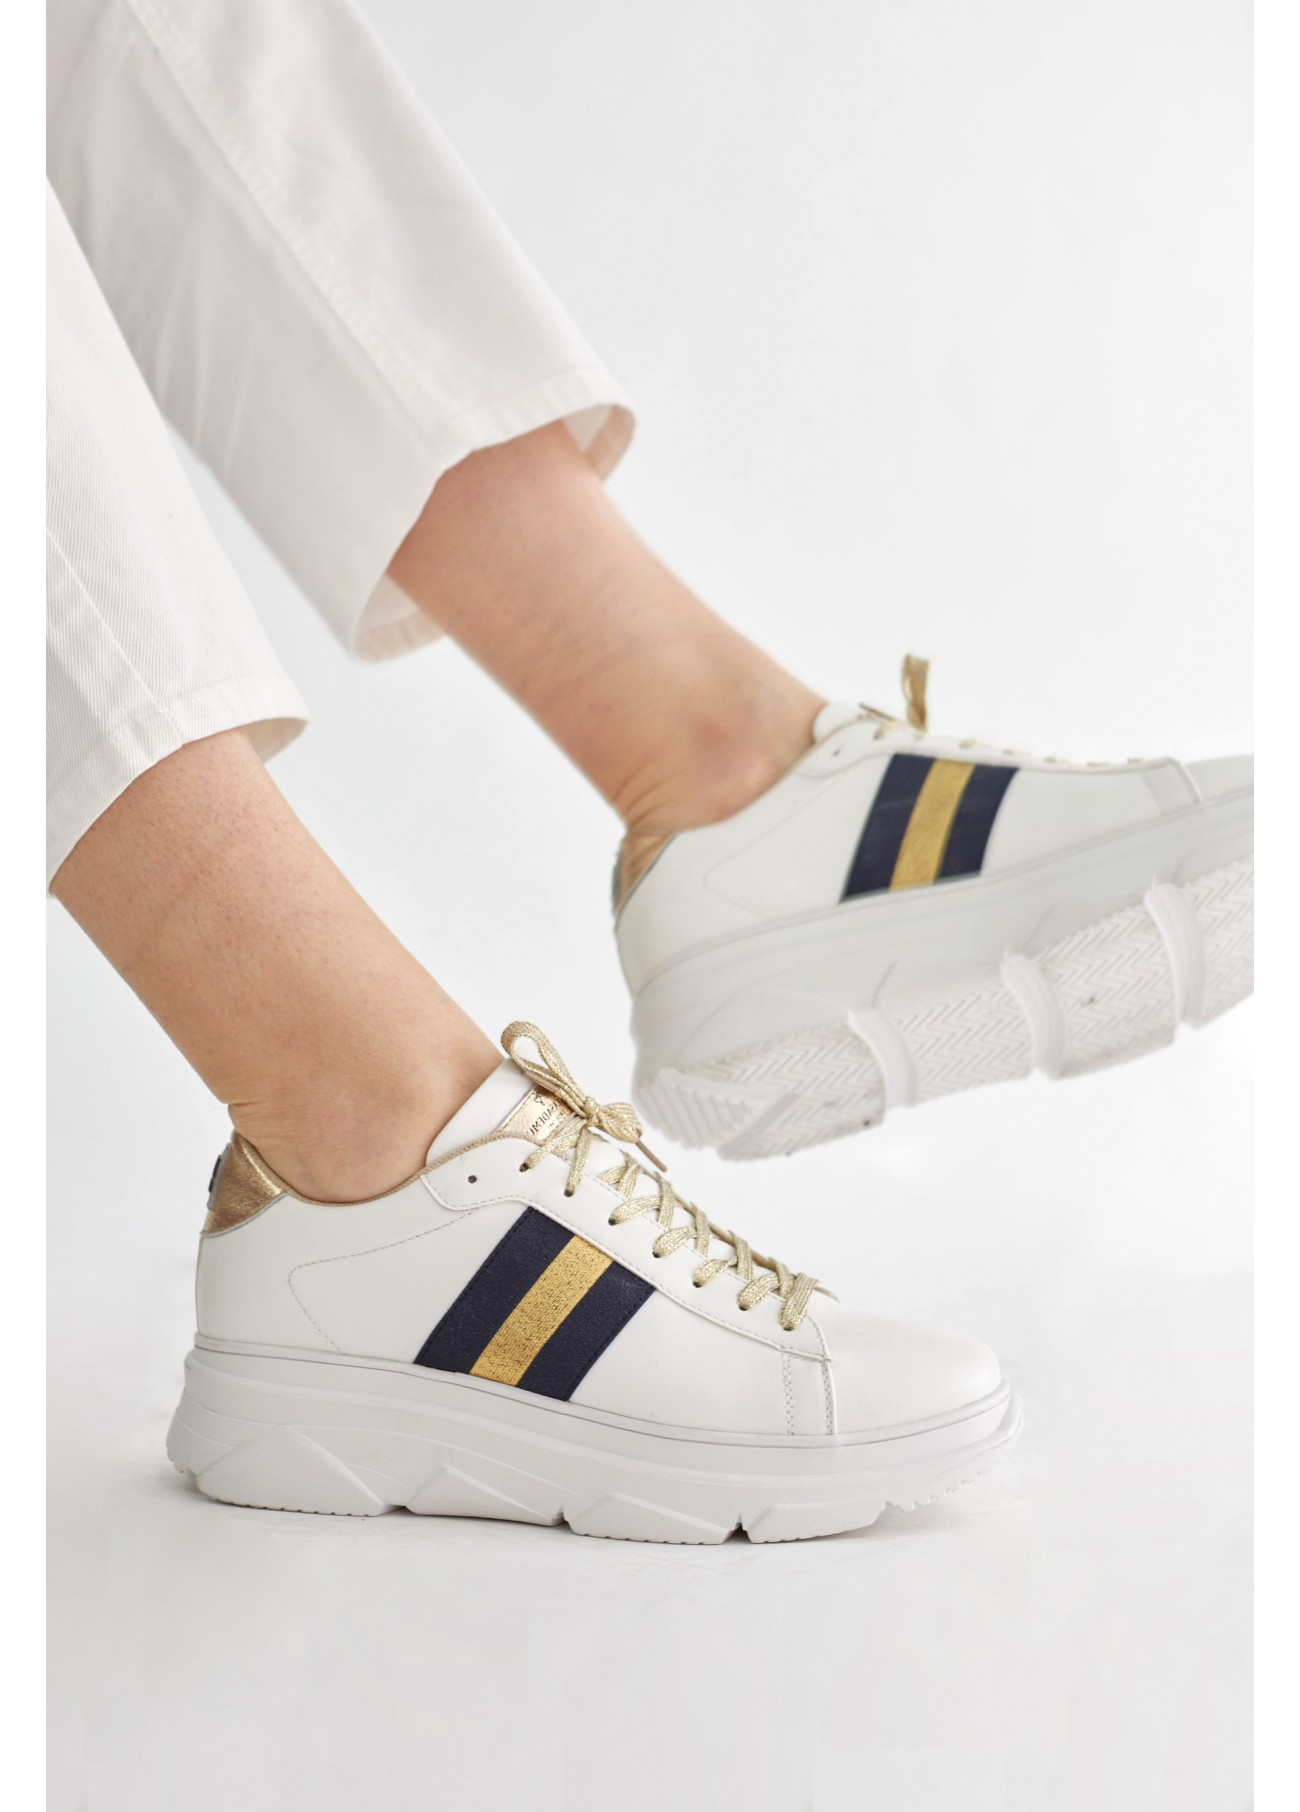 Sneaker raya dorada, blanco 2